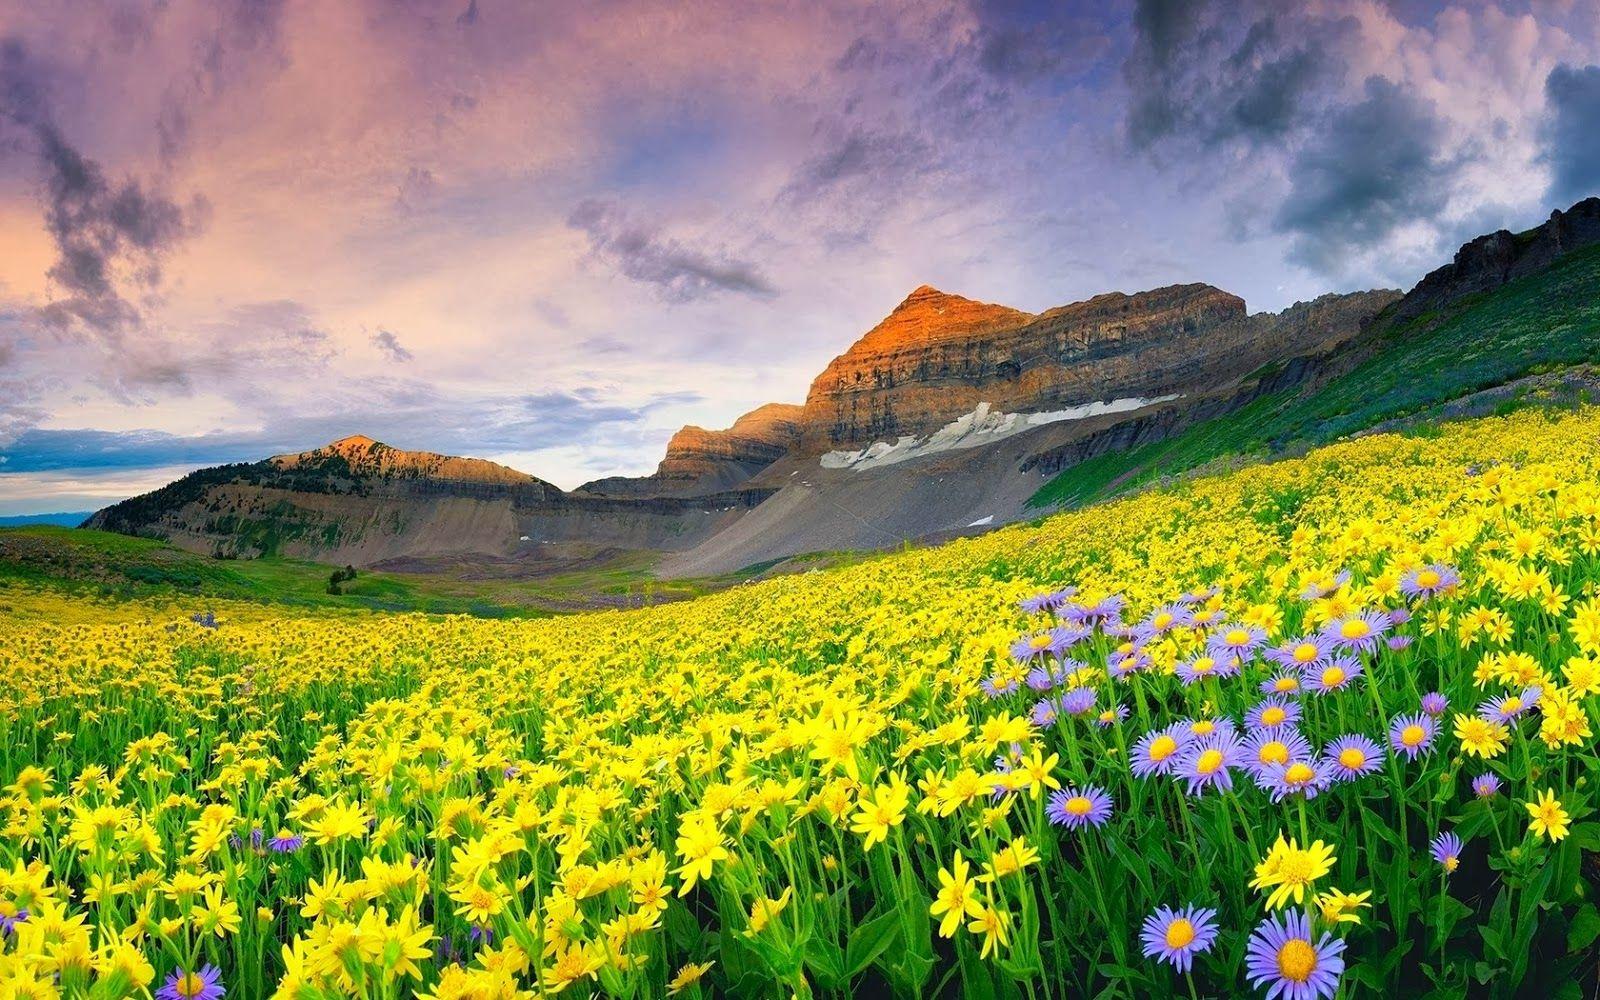 Spring Mountain Landscape Flowers Purple Colored Hills: Paisaje Hermosos Para Fondo Celular En Hd 18 HD Wallpapers